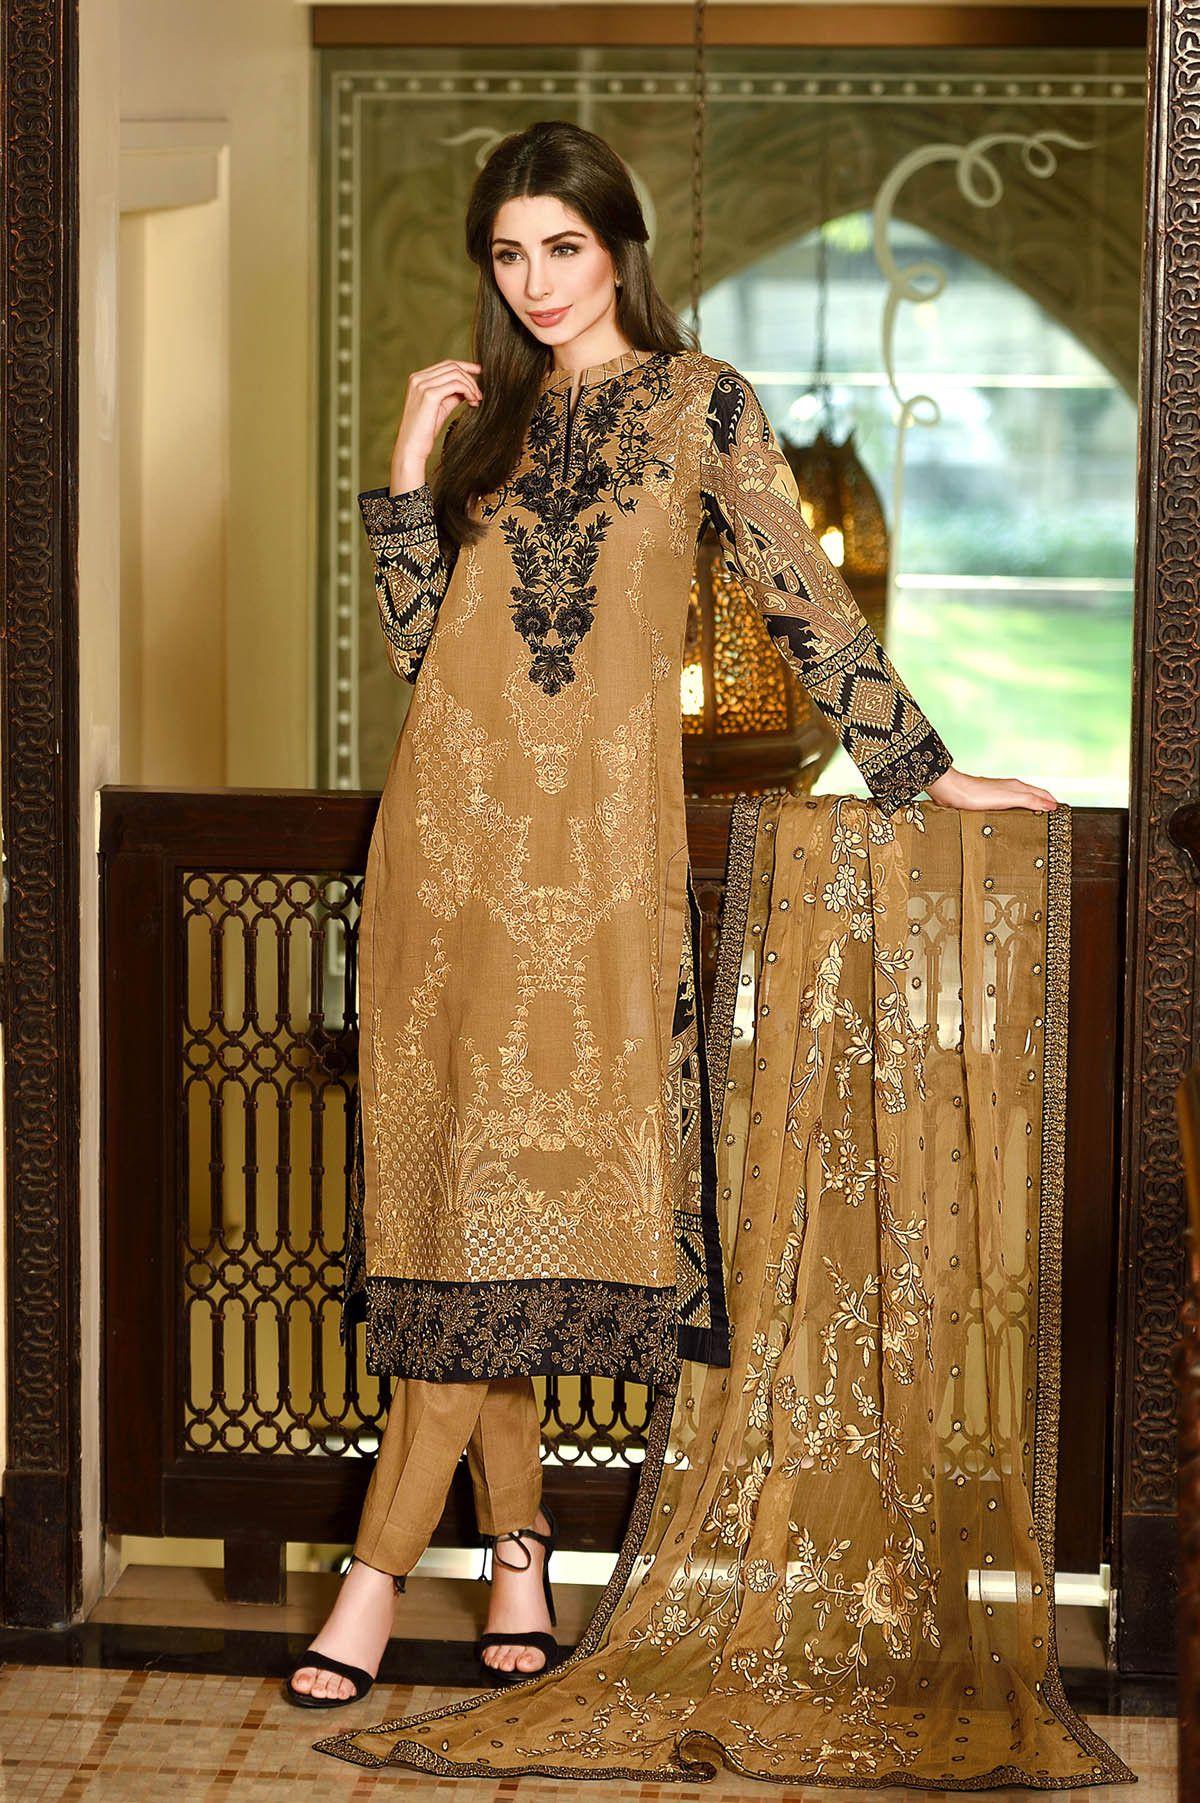 Berühmt Pakistanisch Party Kleider Online Shopping Galerie ...